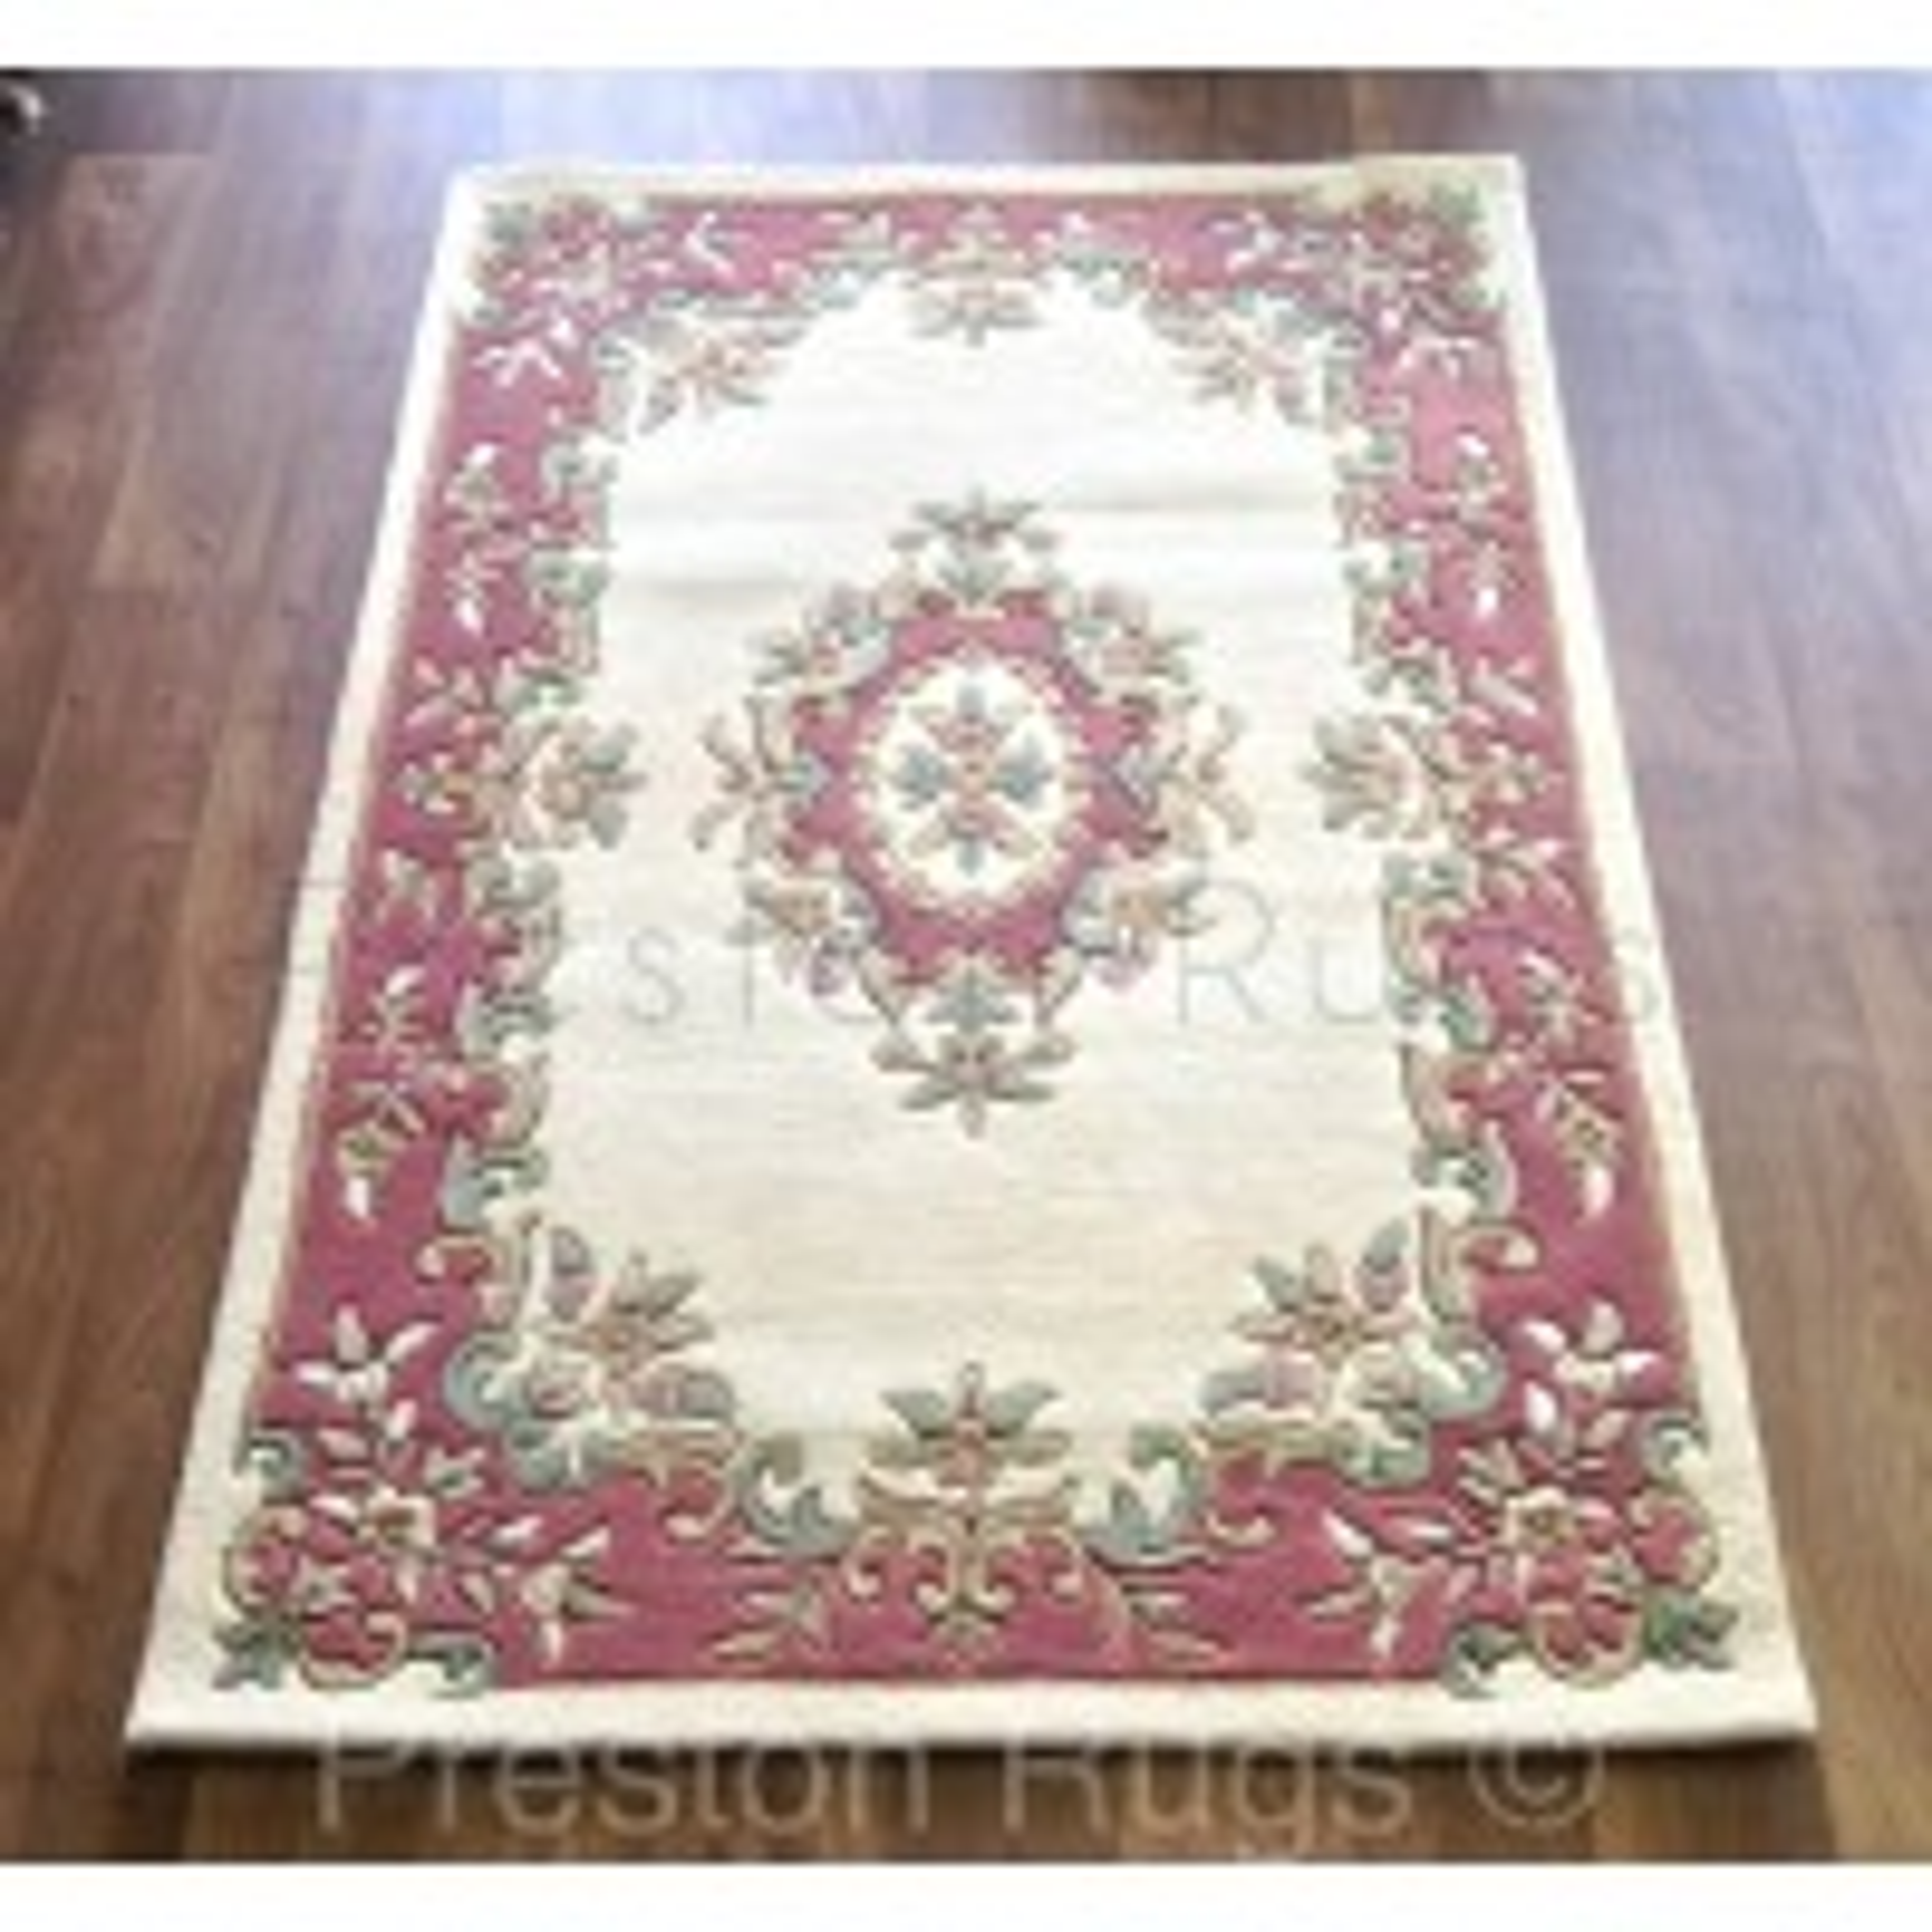 Royal Traditional Wool Rug - Cream Rose-120 x 180 cm